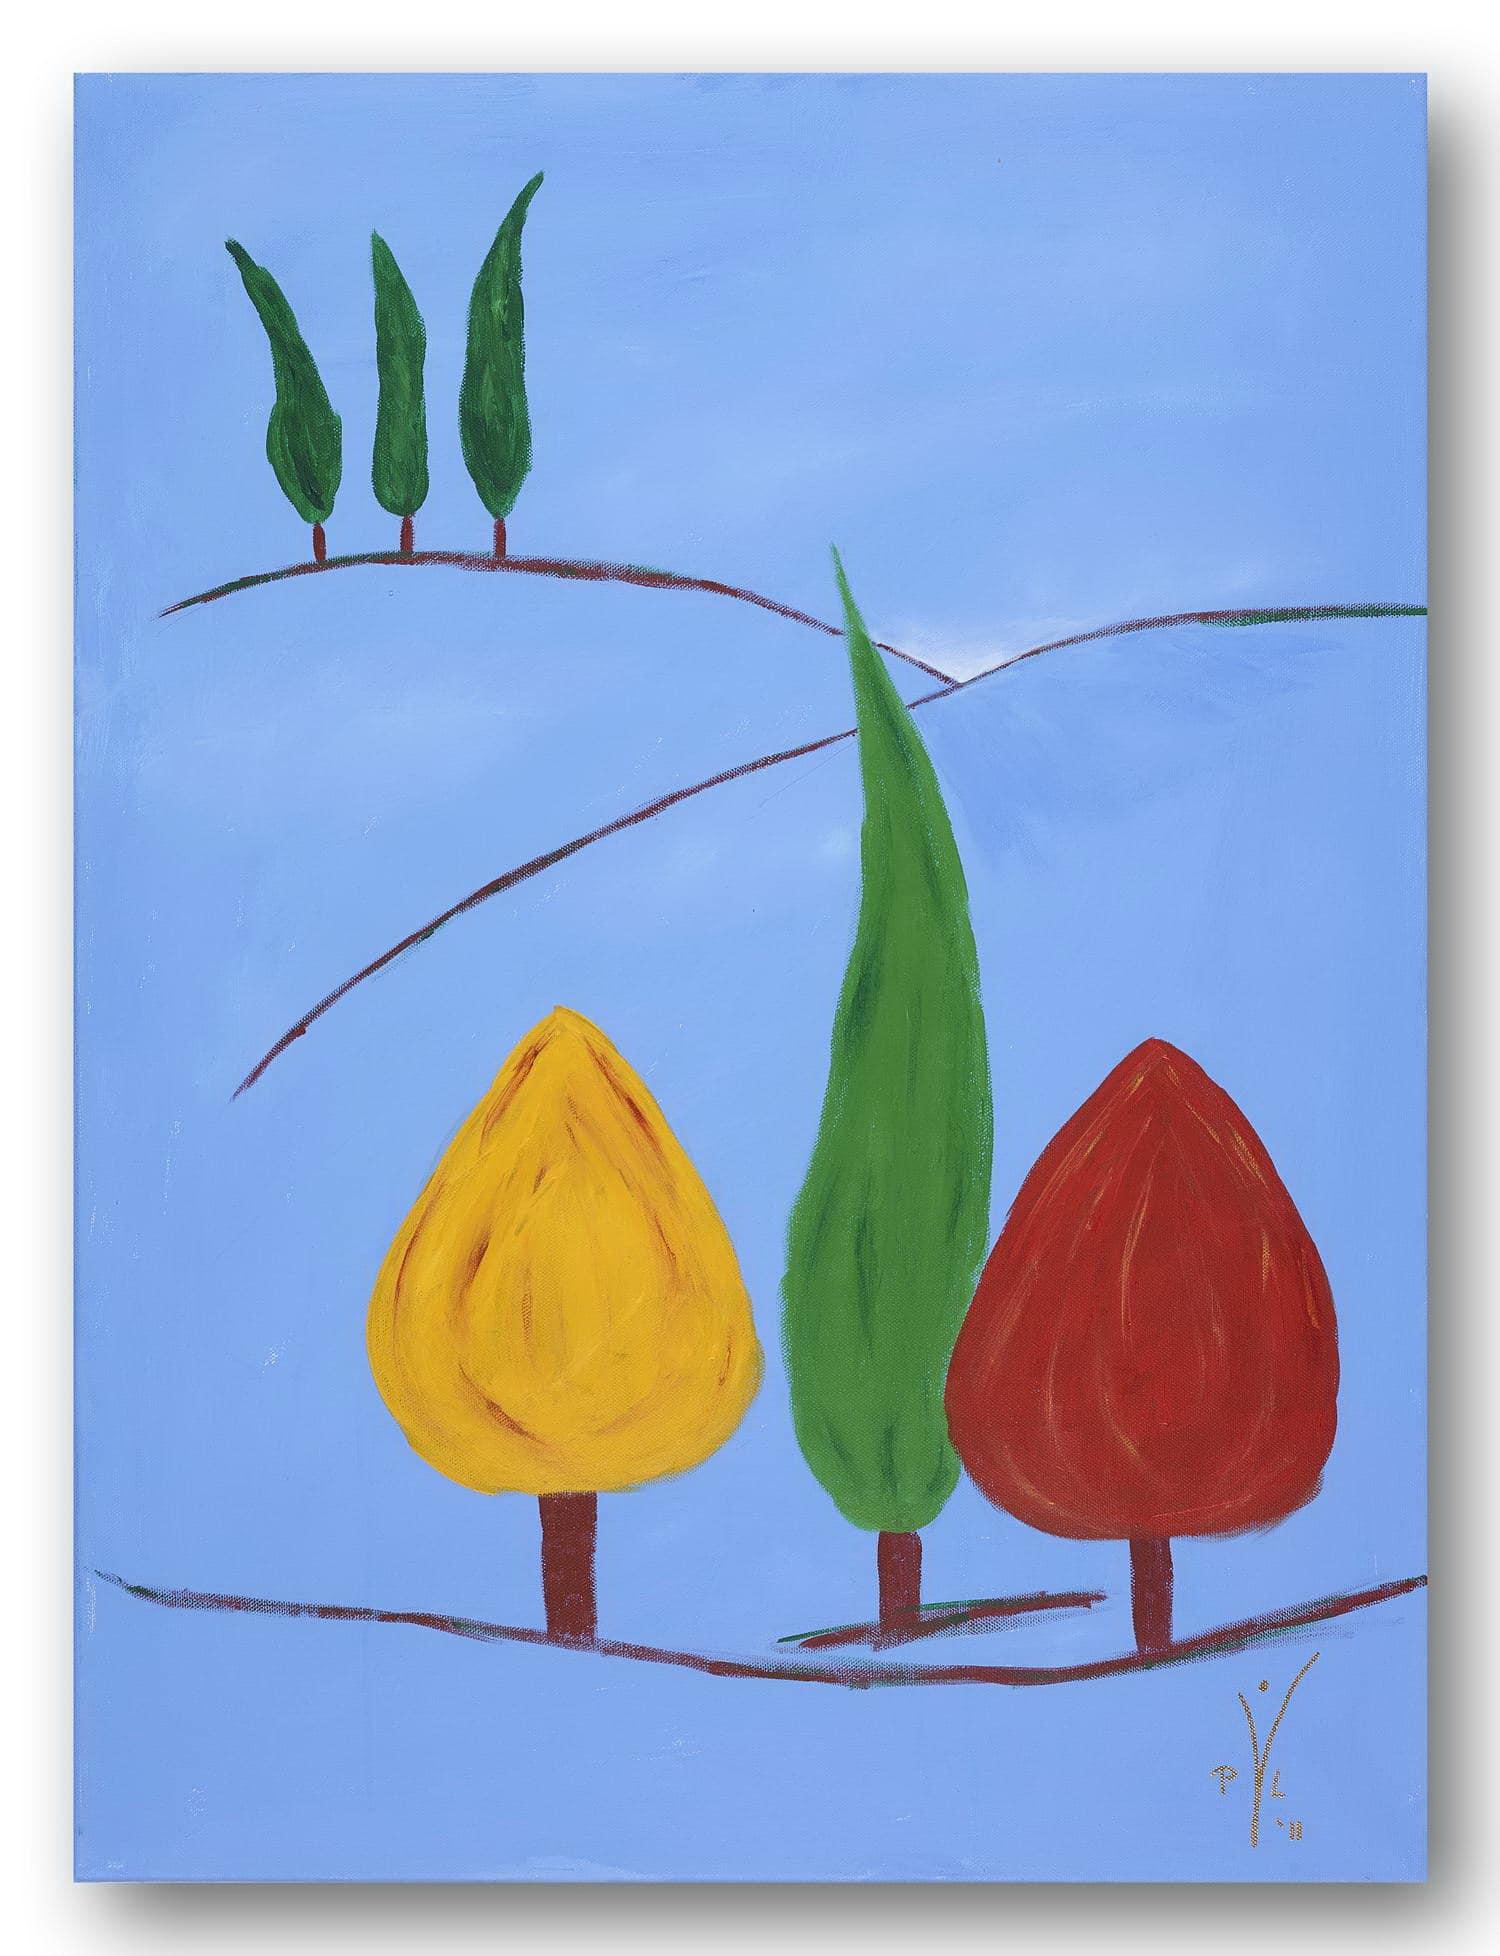 Toskana macht blau - Acrylic / Canvas 60 x 80 cm, 23.6 x 31.5 inch